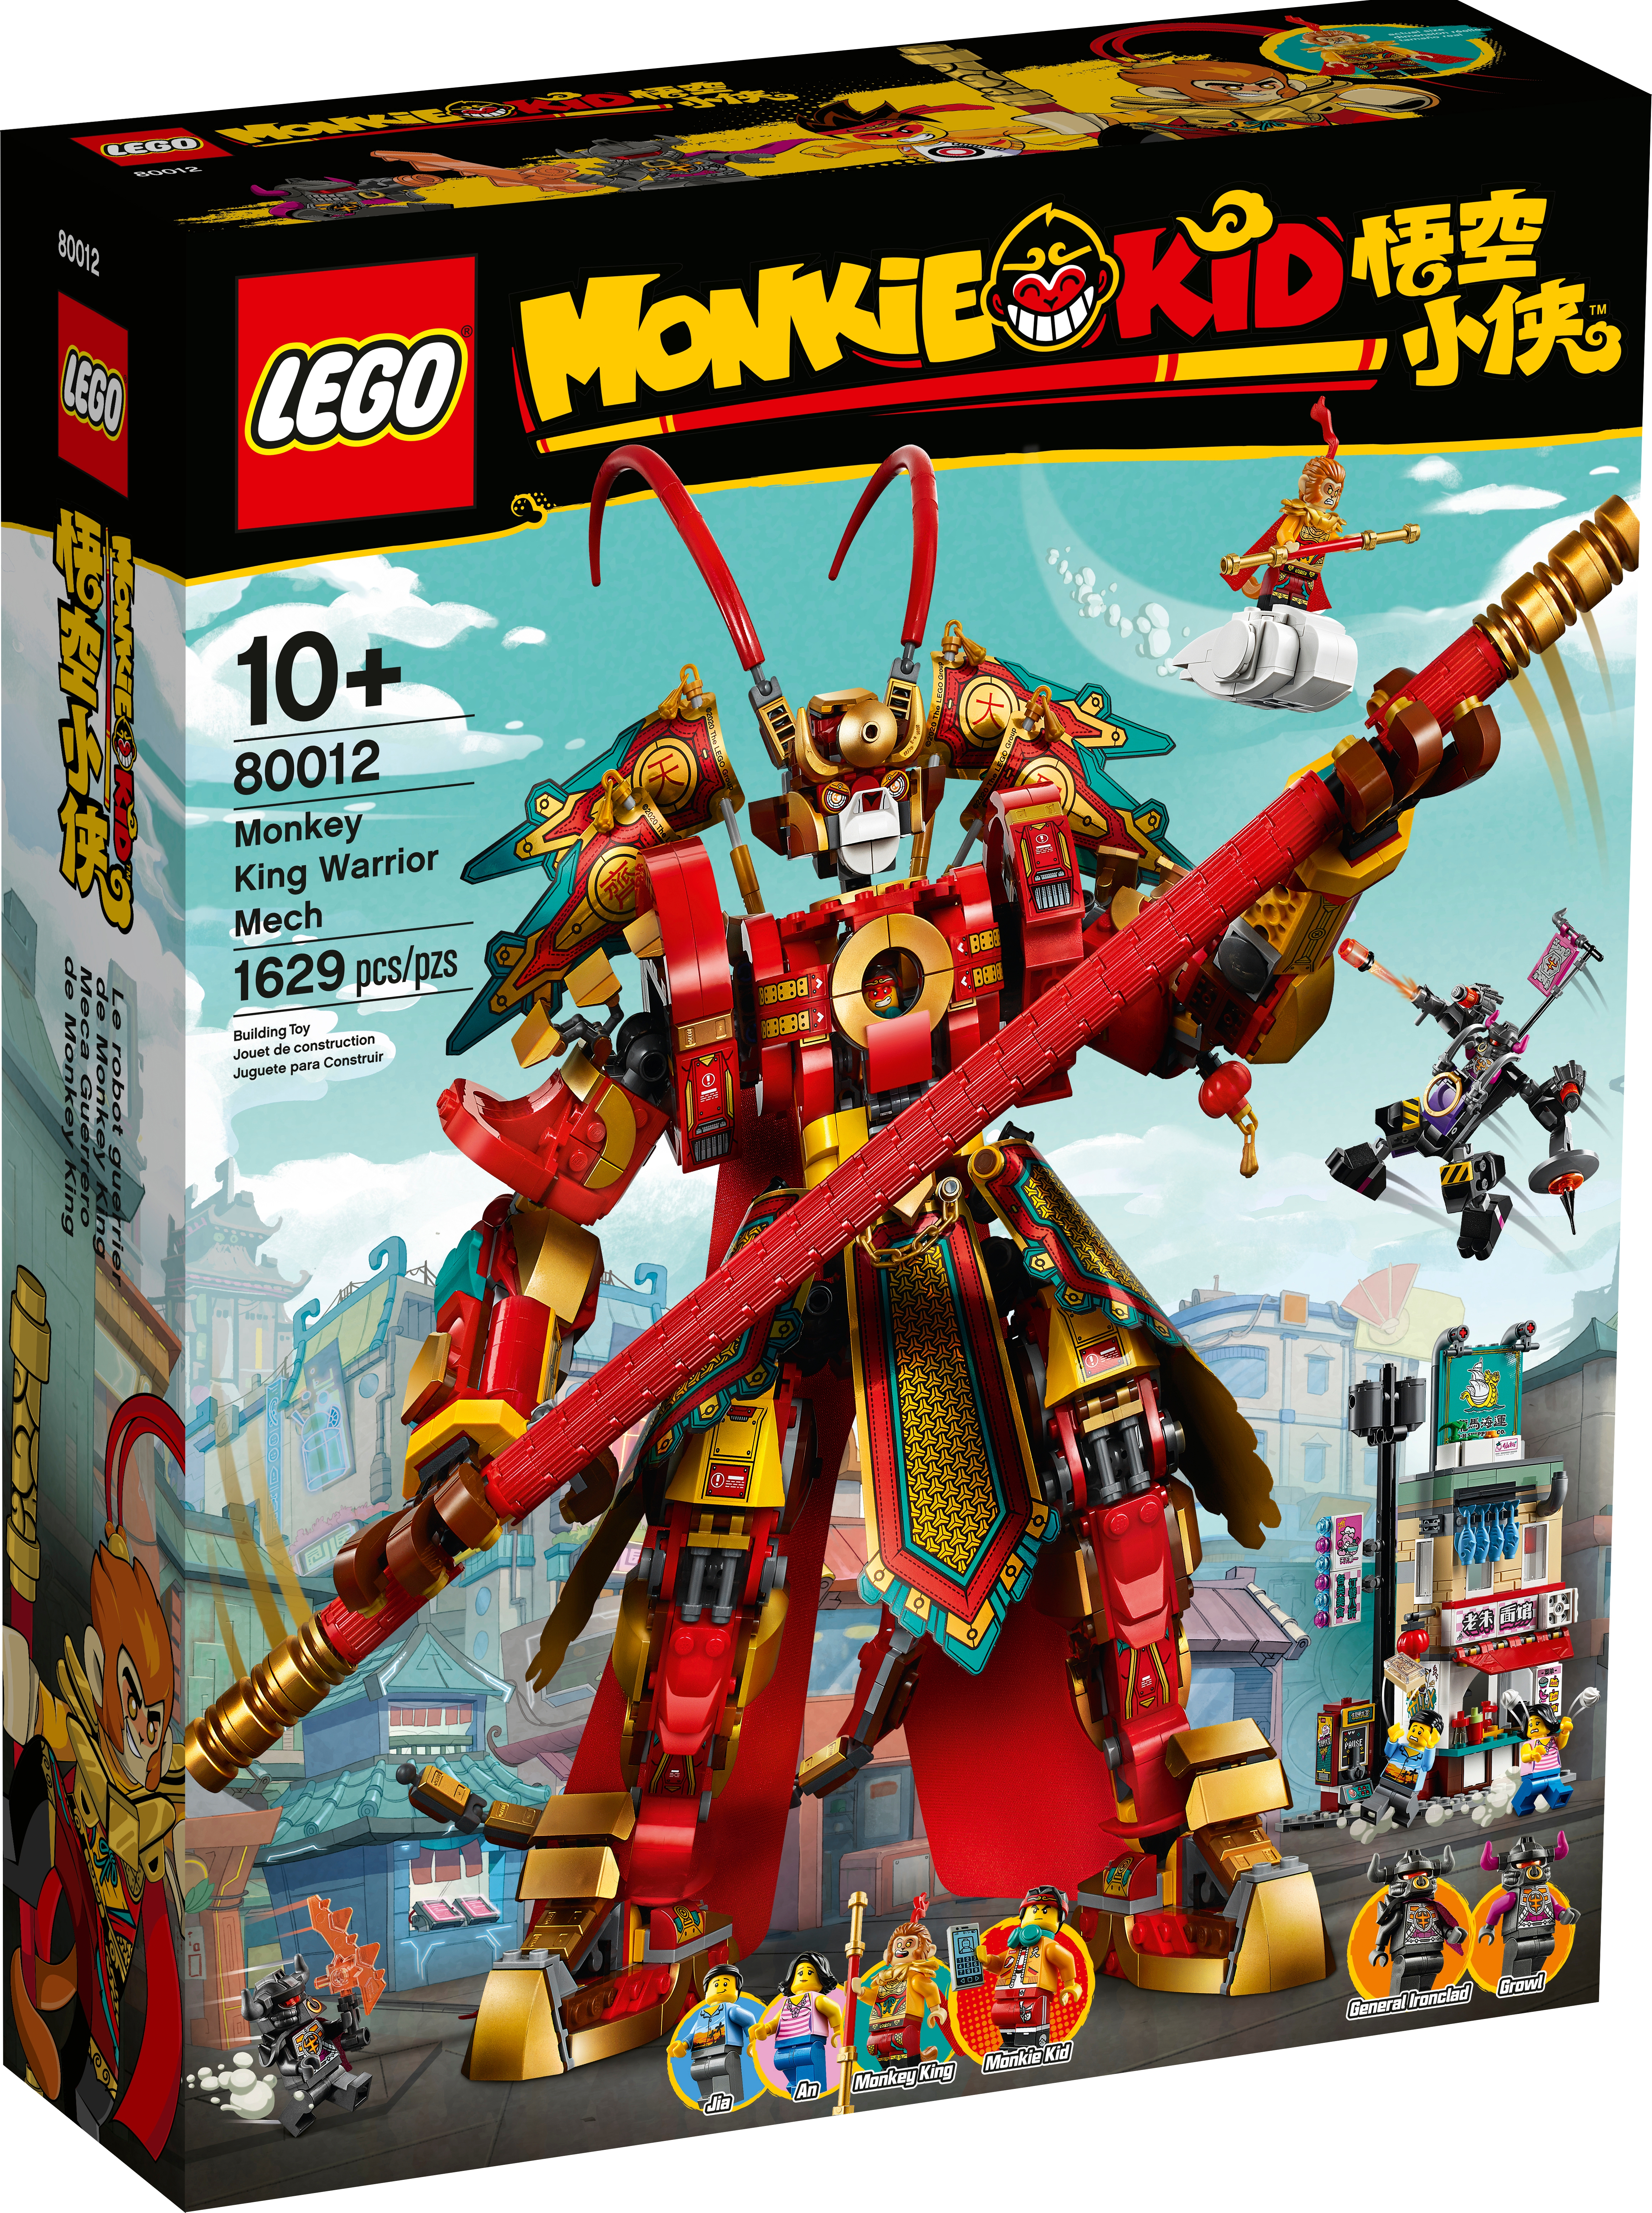 Exclusive! LEGO 80012 Monkie Kid Monkey King Warrior Mech Sealed New